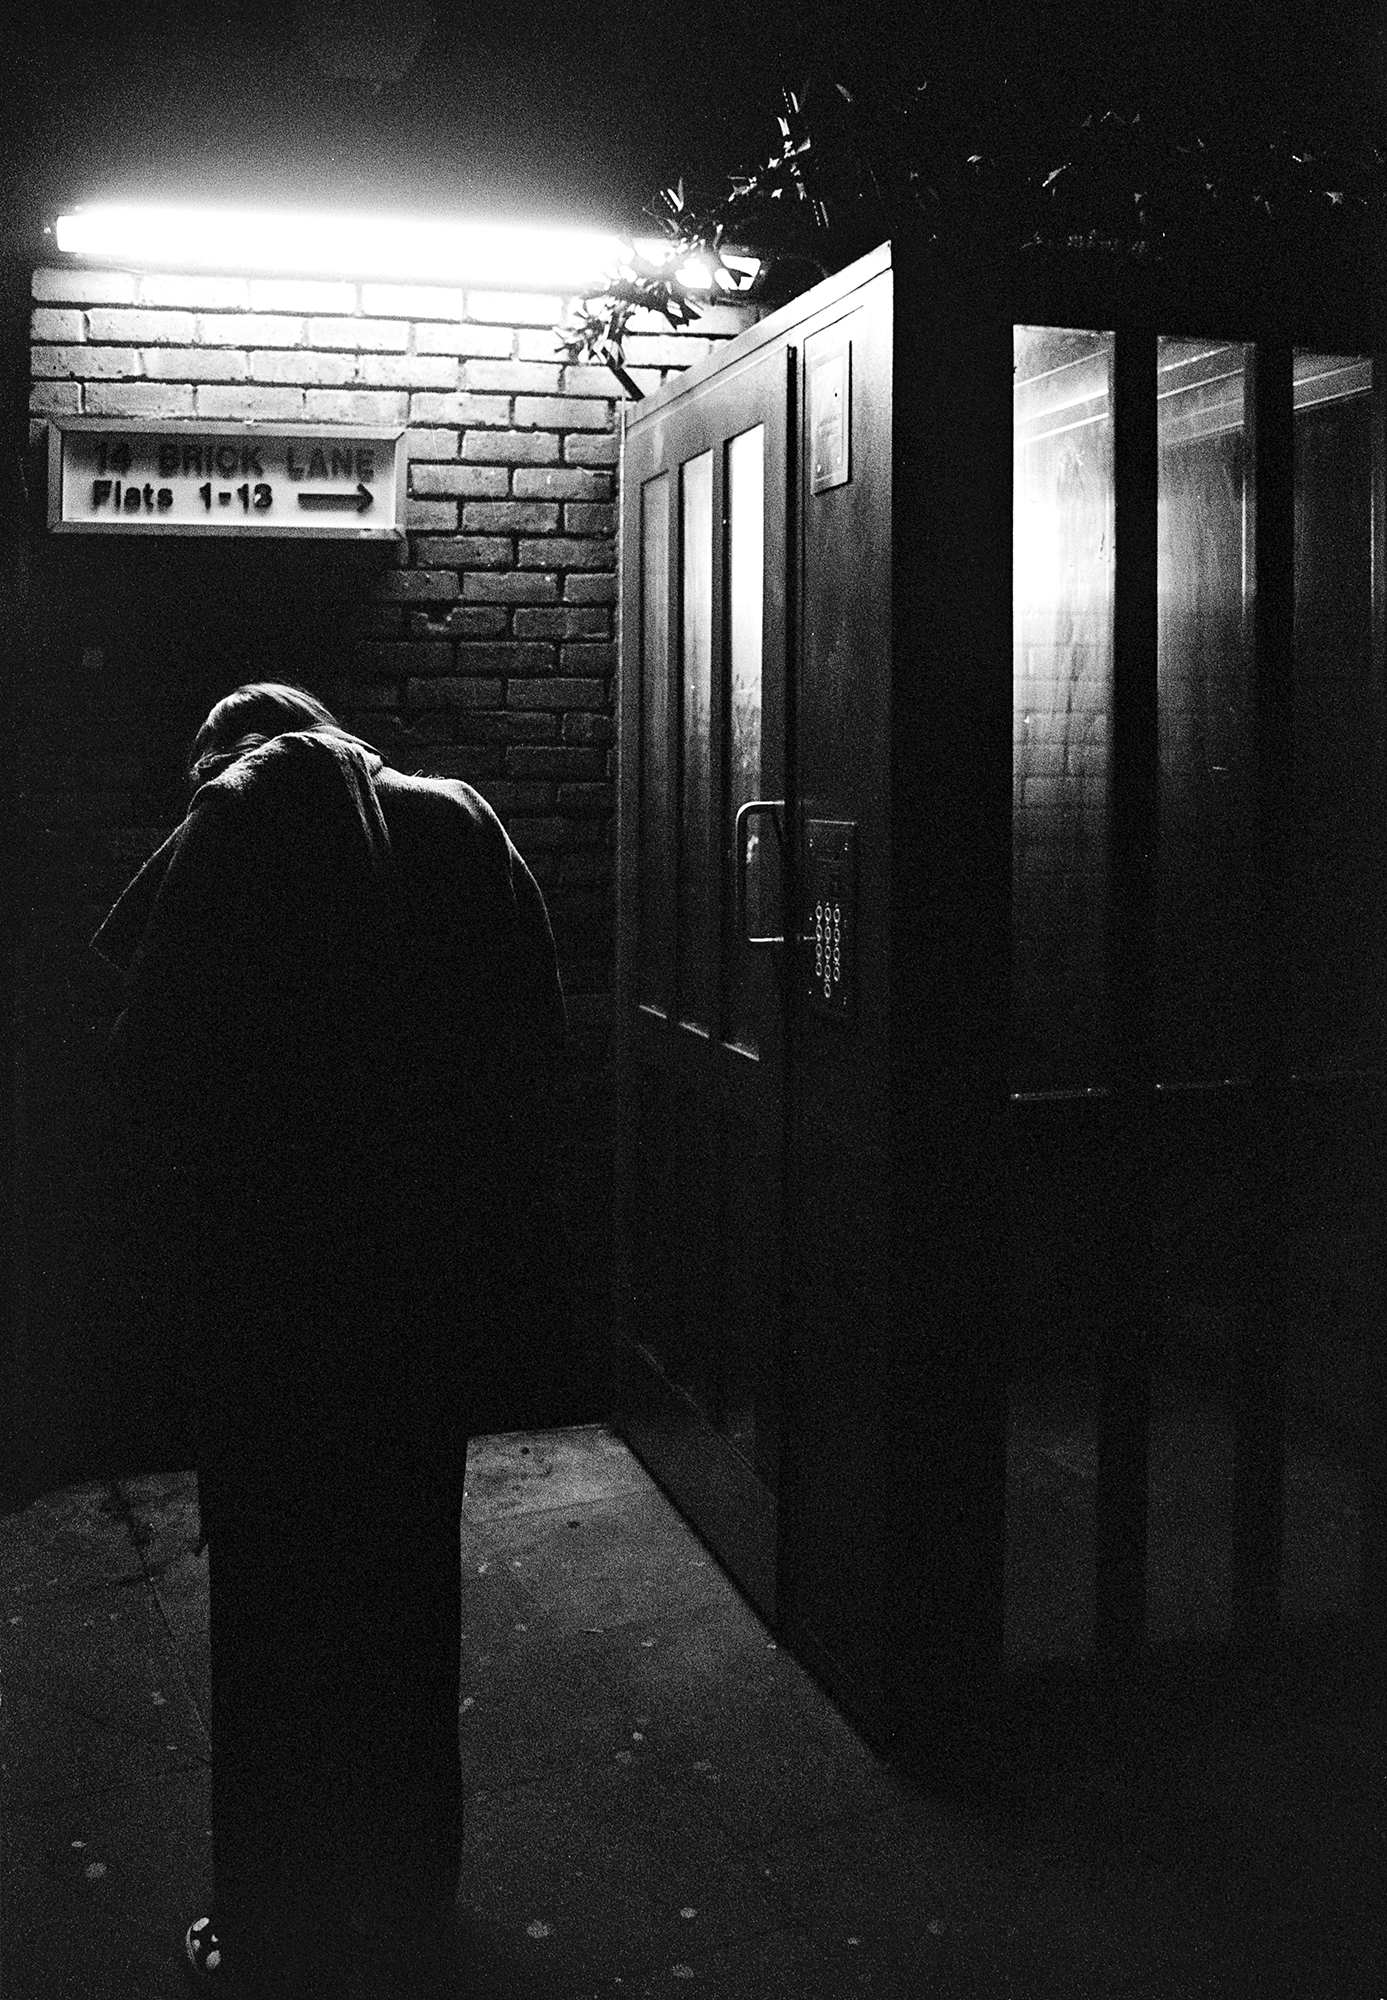 Oscar-arribas-photography-fotografo-portrait-retrato-editorial-london-street-photography-urbana-londres-film-analog-35mm-night-nocturna-52.jpg